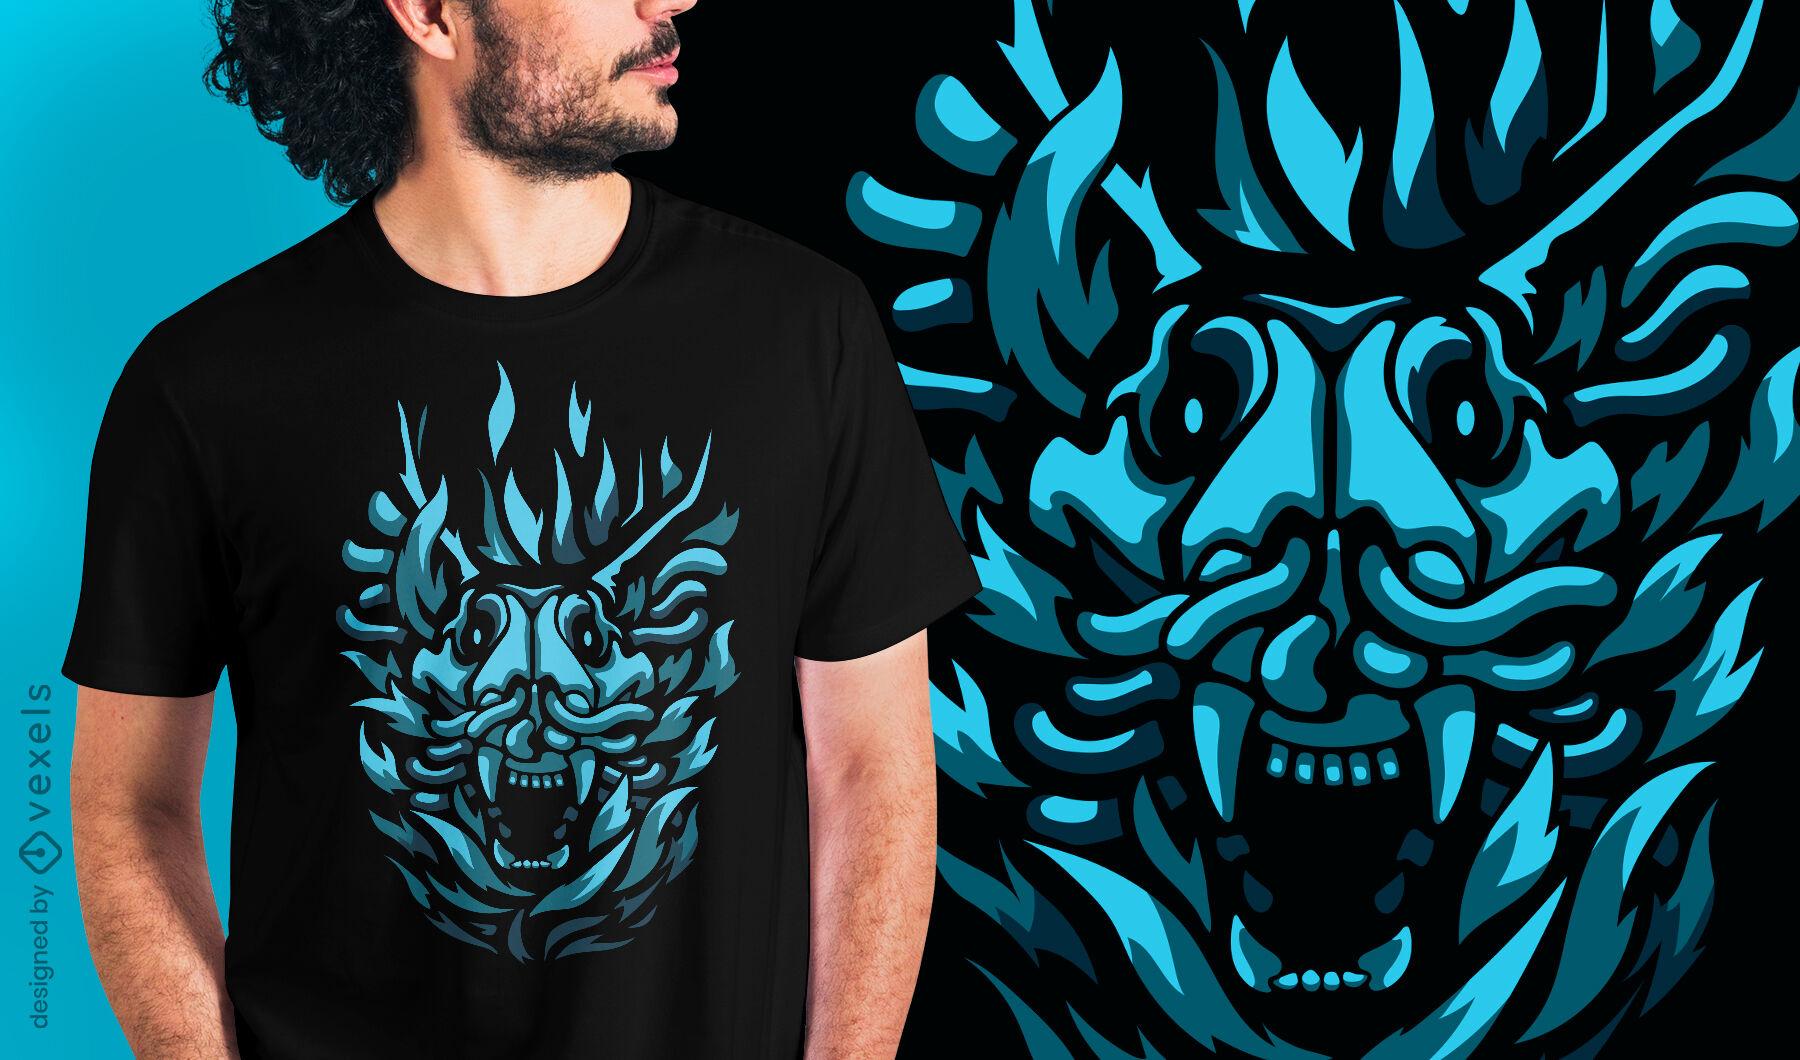 Diseño de camiseta de cabeza de animal demonio criatura oscura